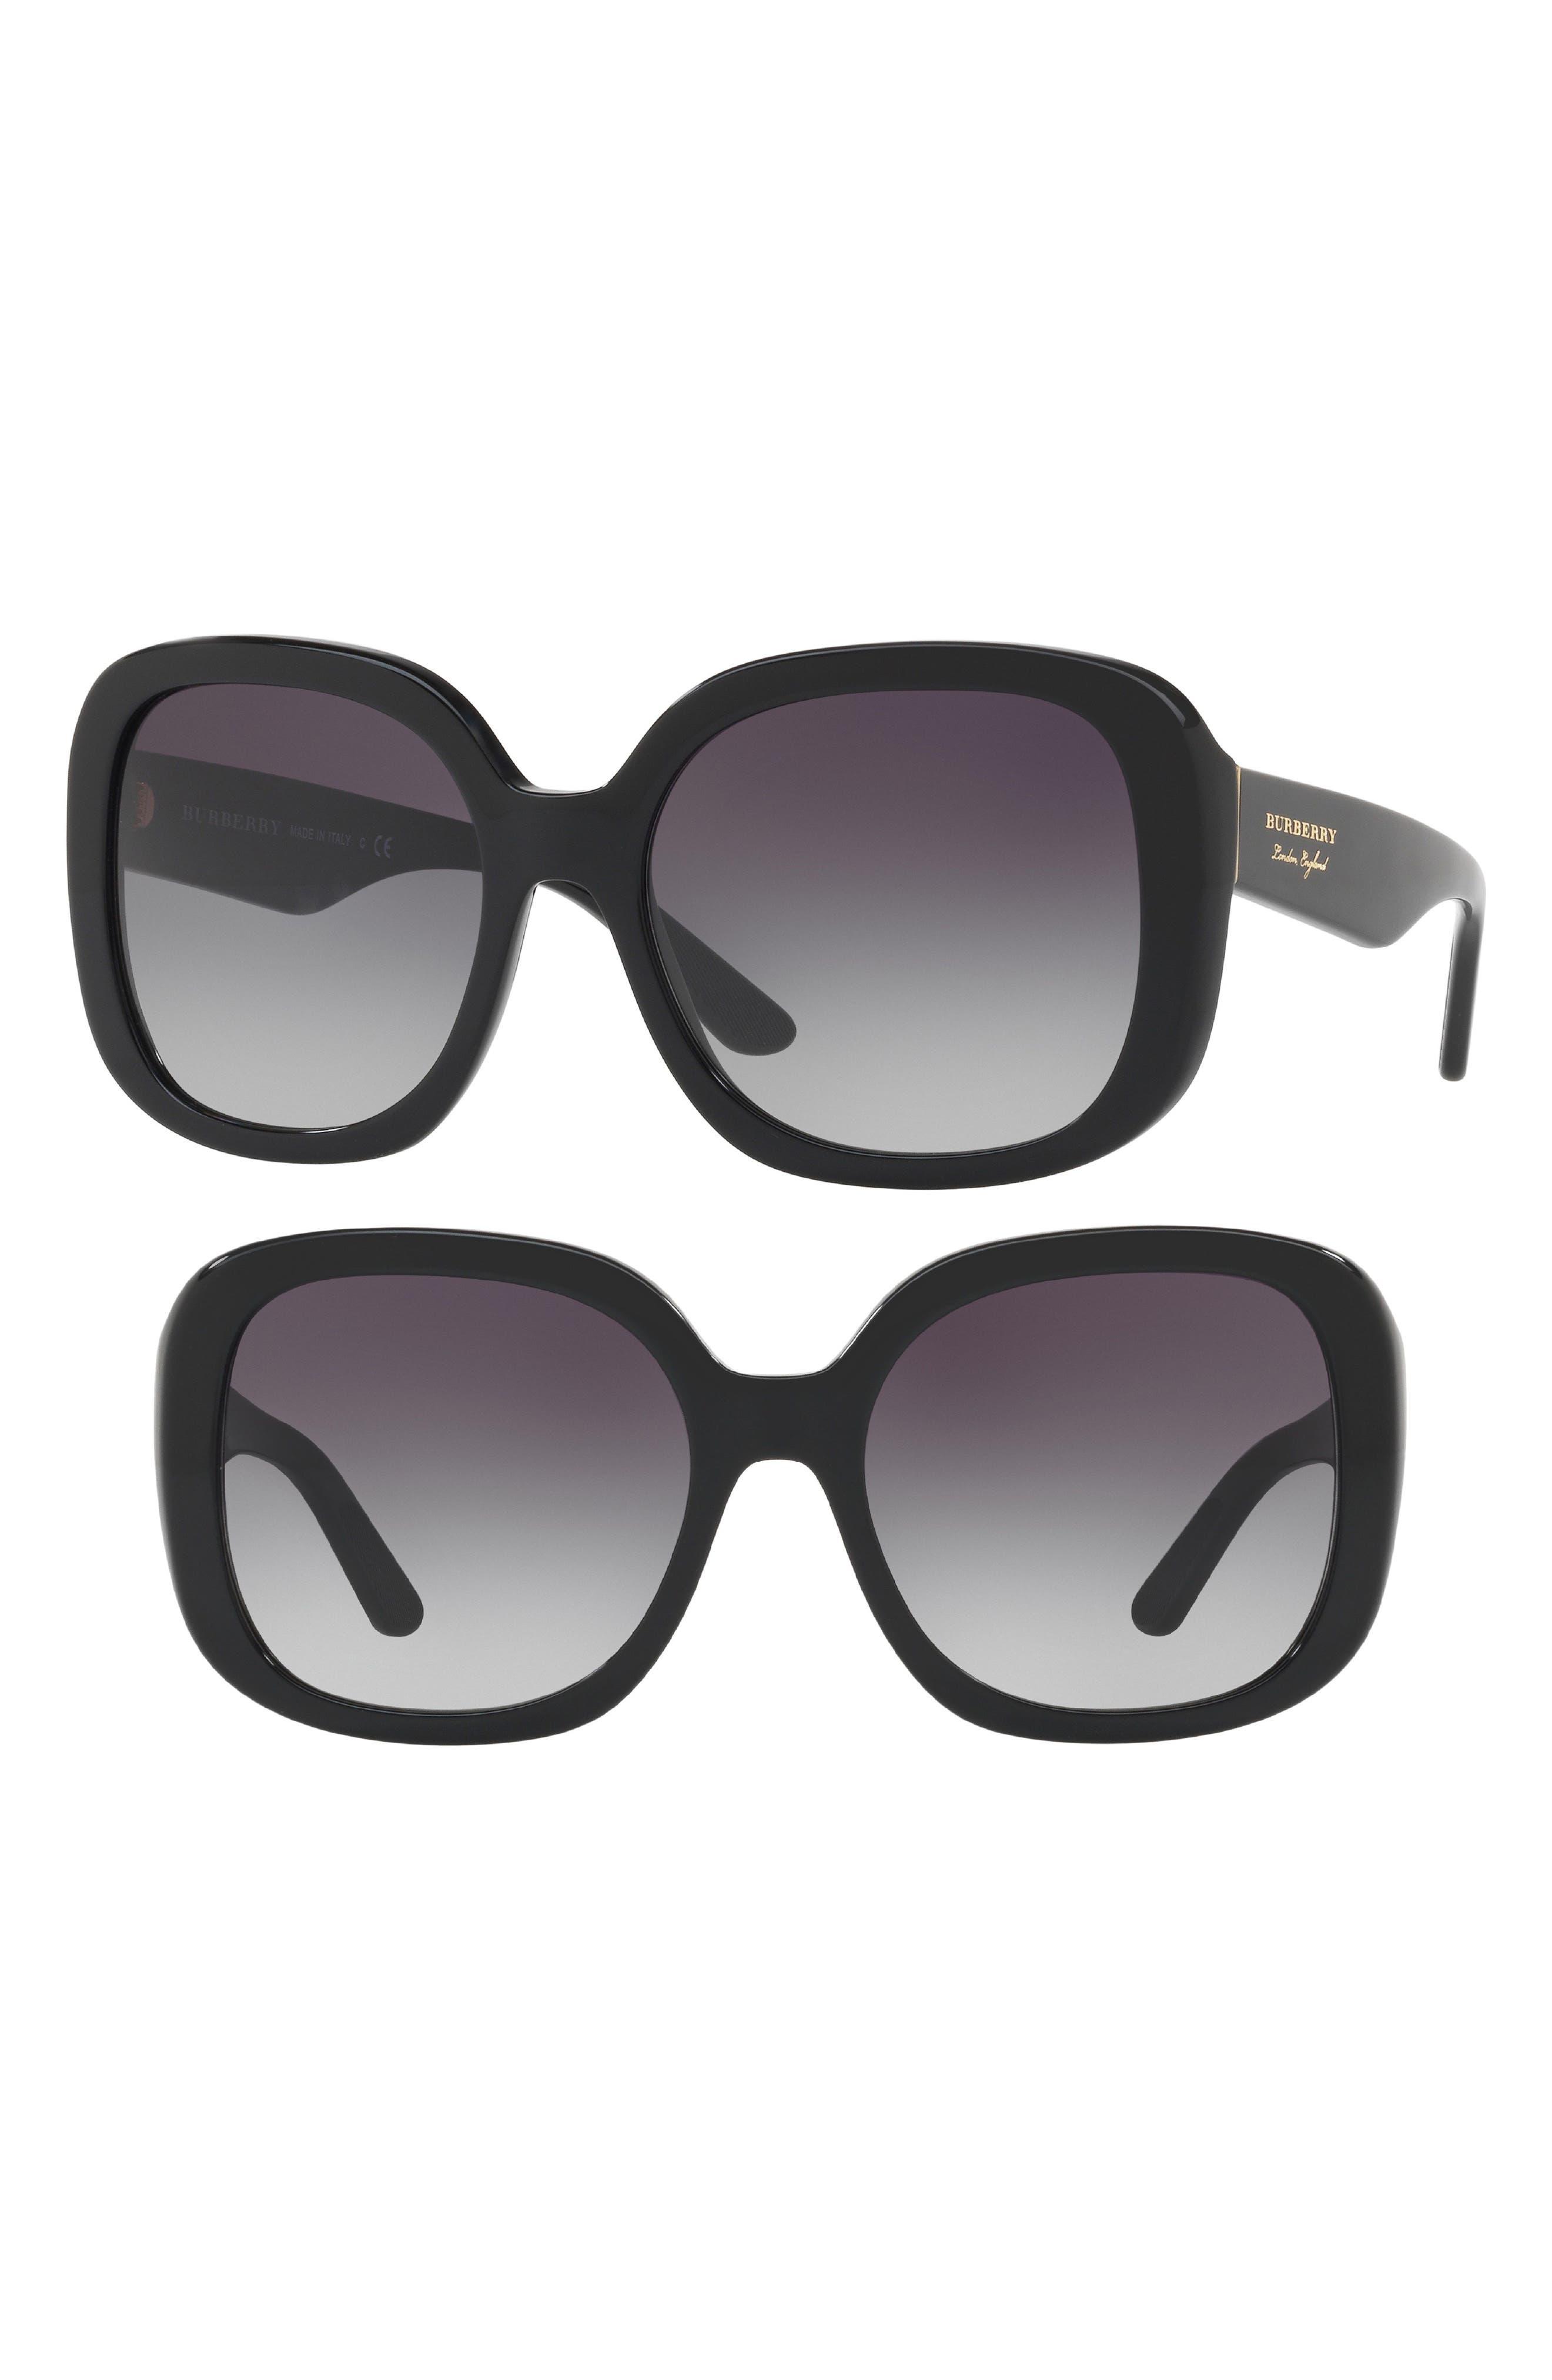 Burberry 56mm Gradient Sunglasses